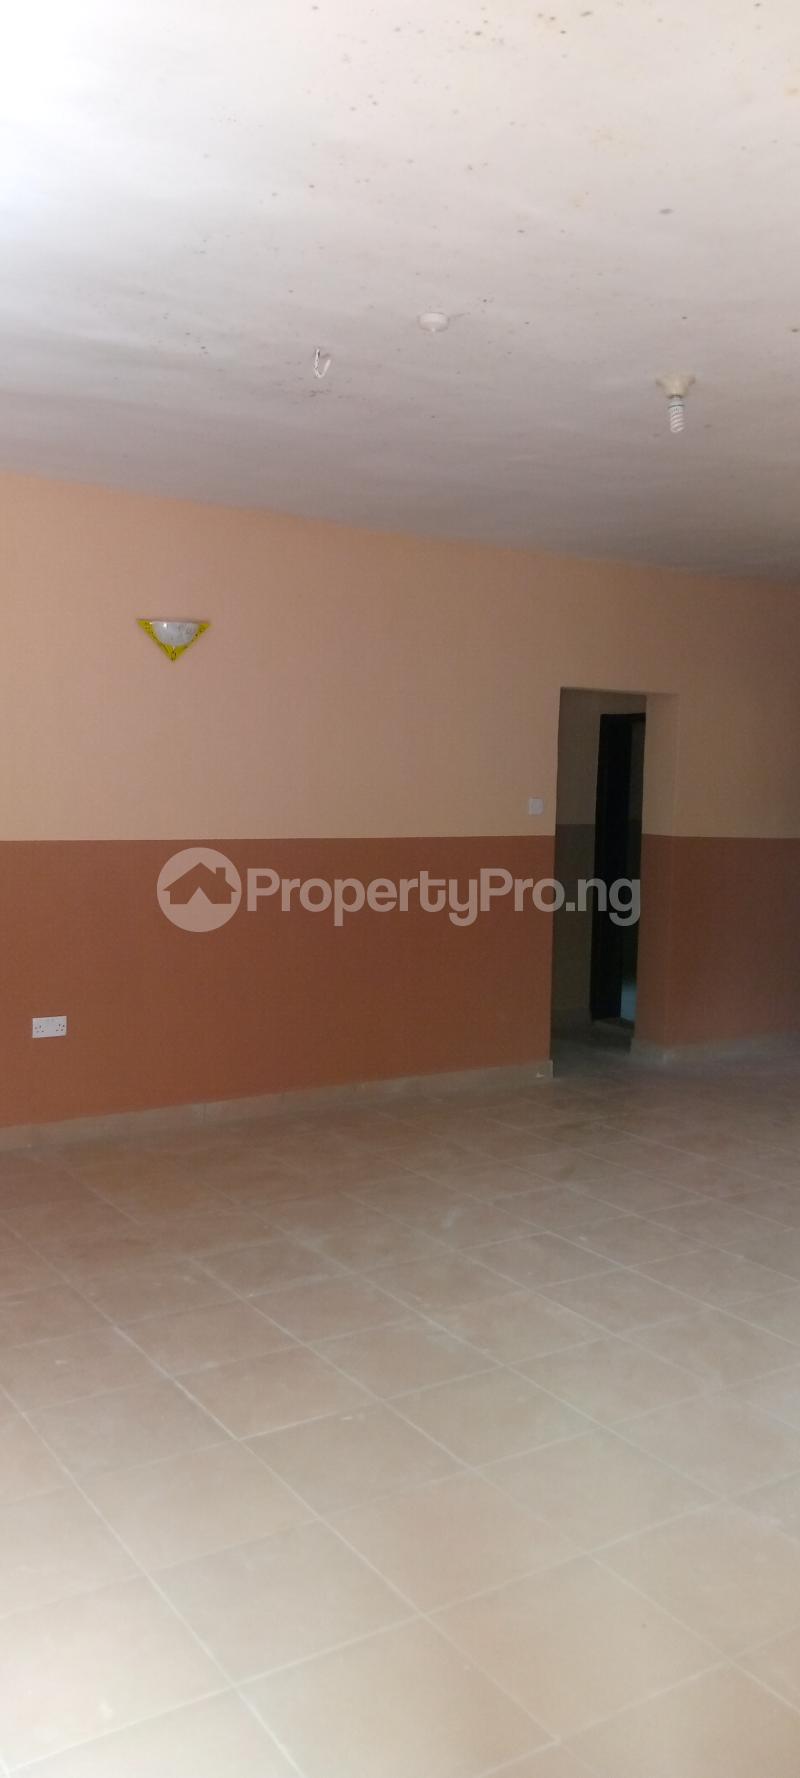 3 bedroom Blocks of Flats House for rent Basin area Ilorin Kwara - 5